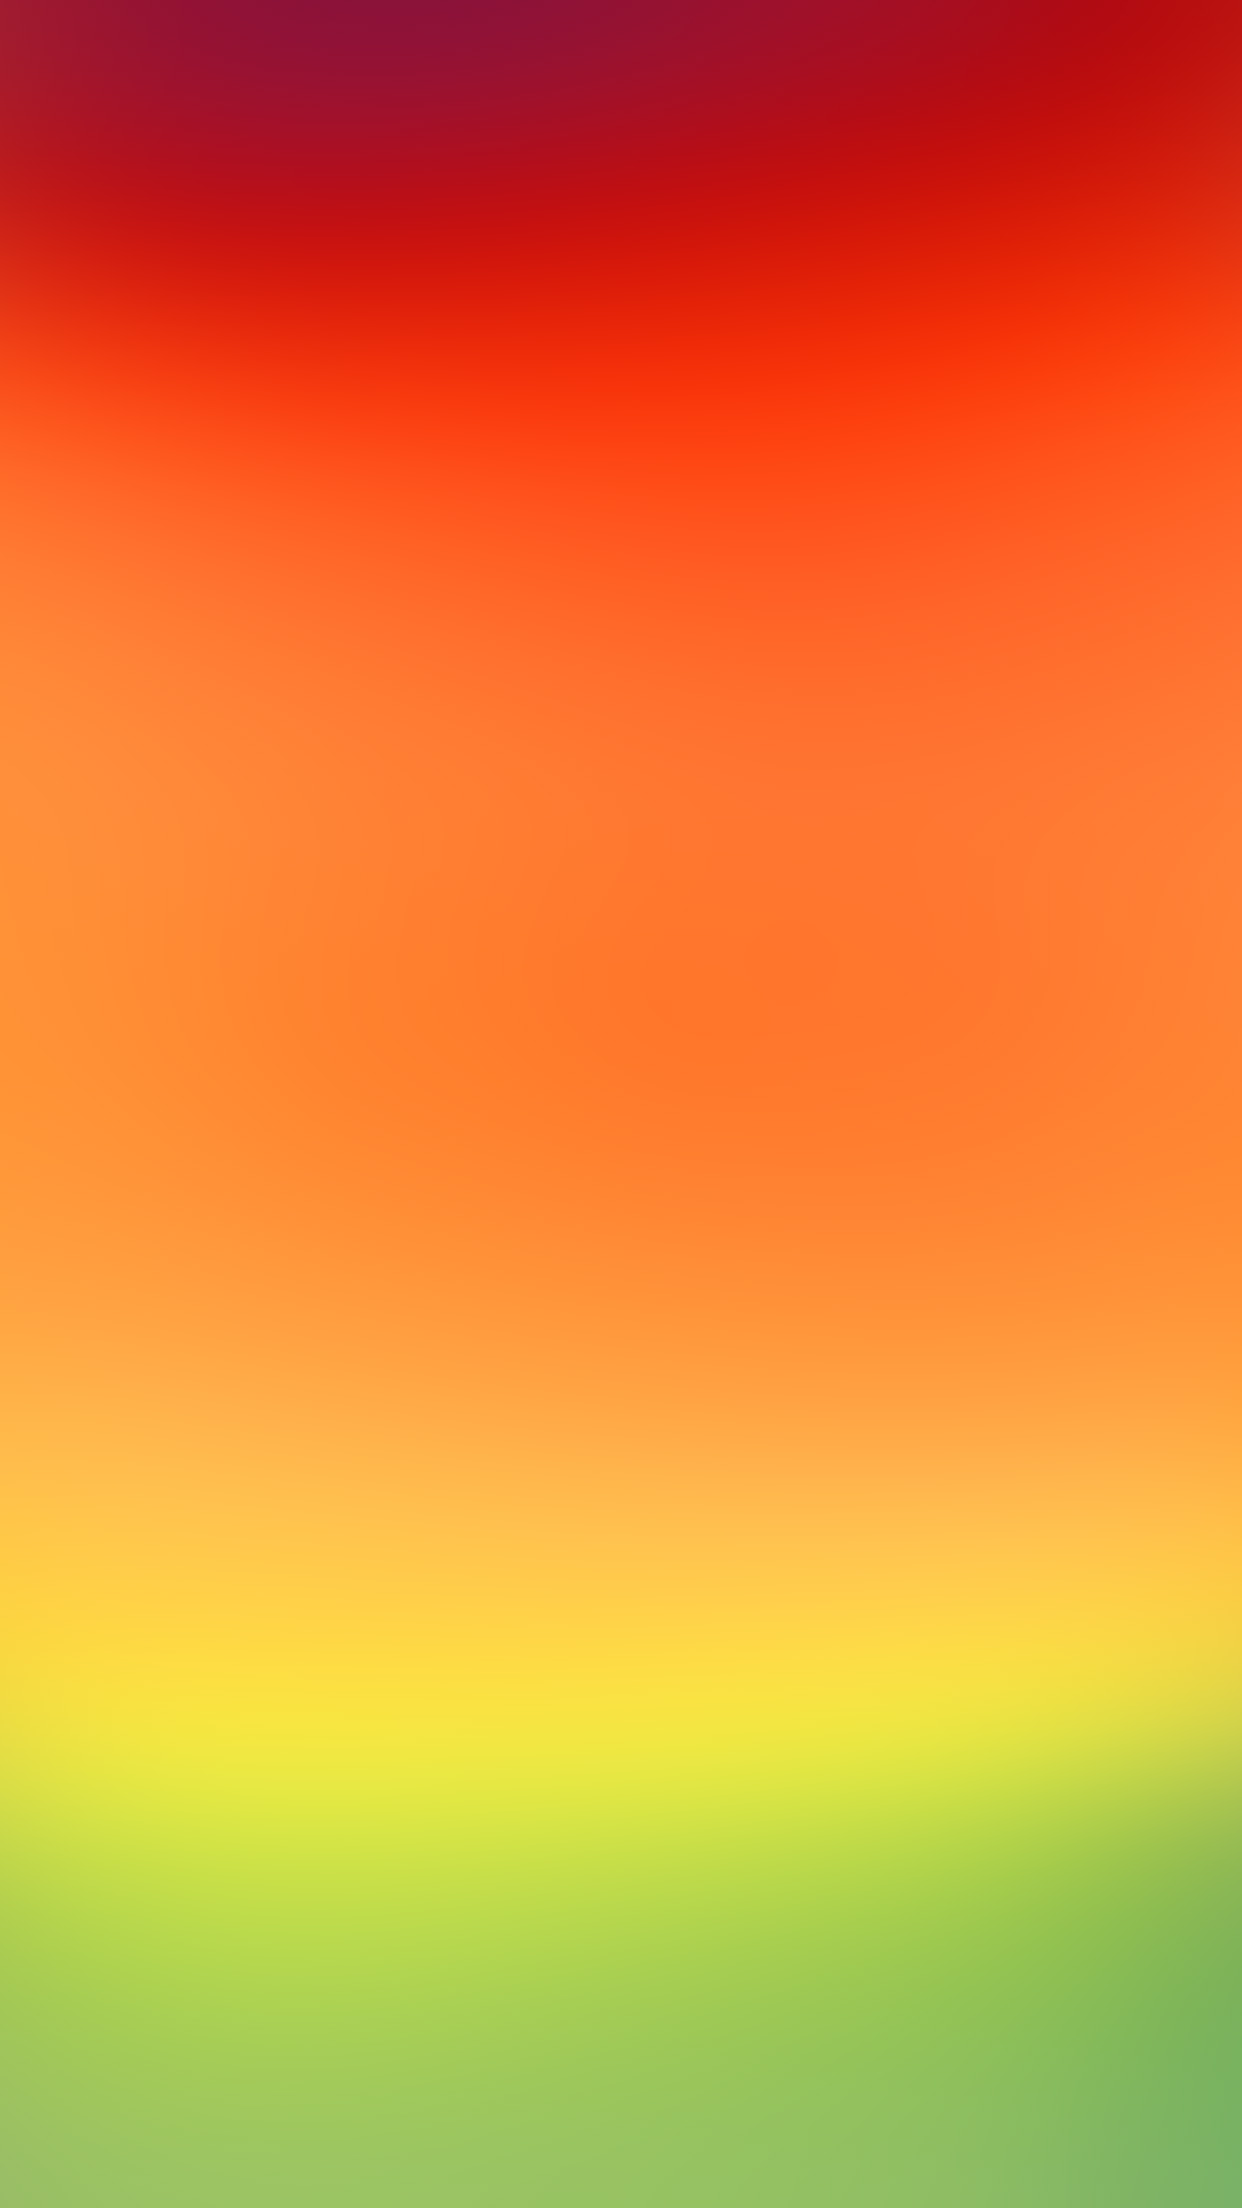 Mac Pro Fall Wallpaper 2017 Iphone Se